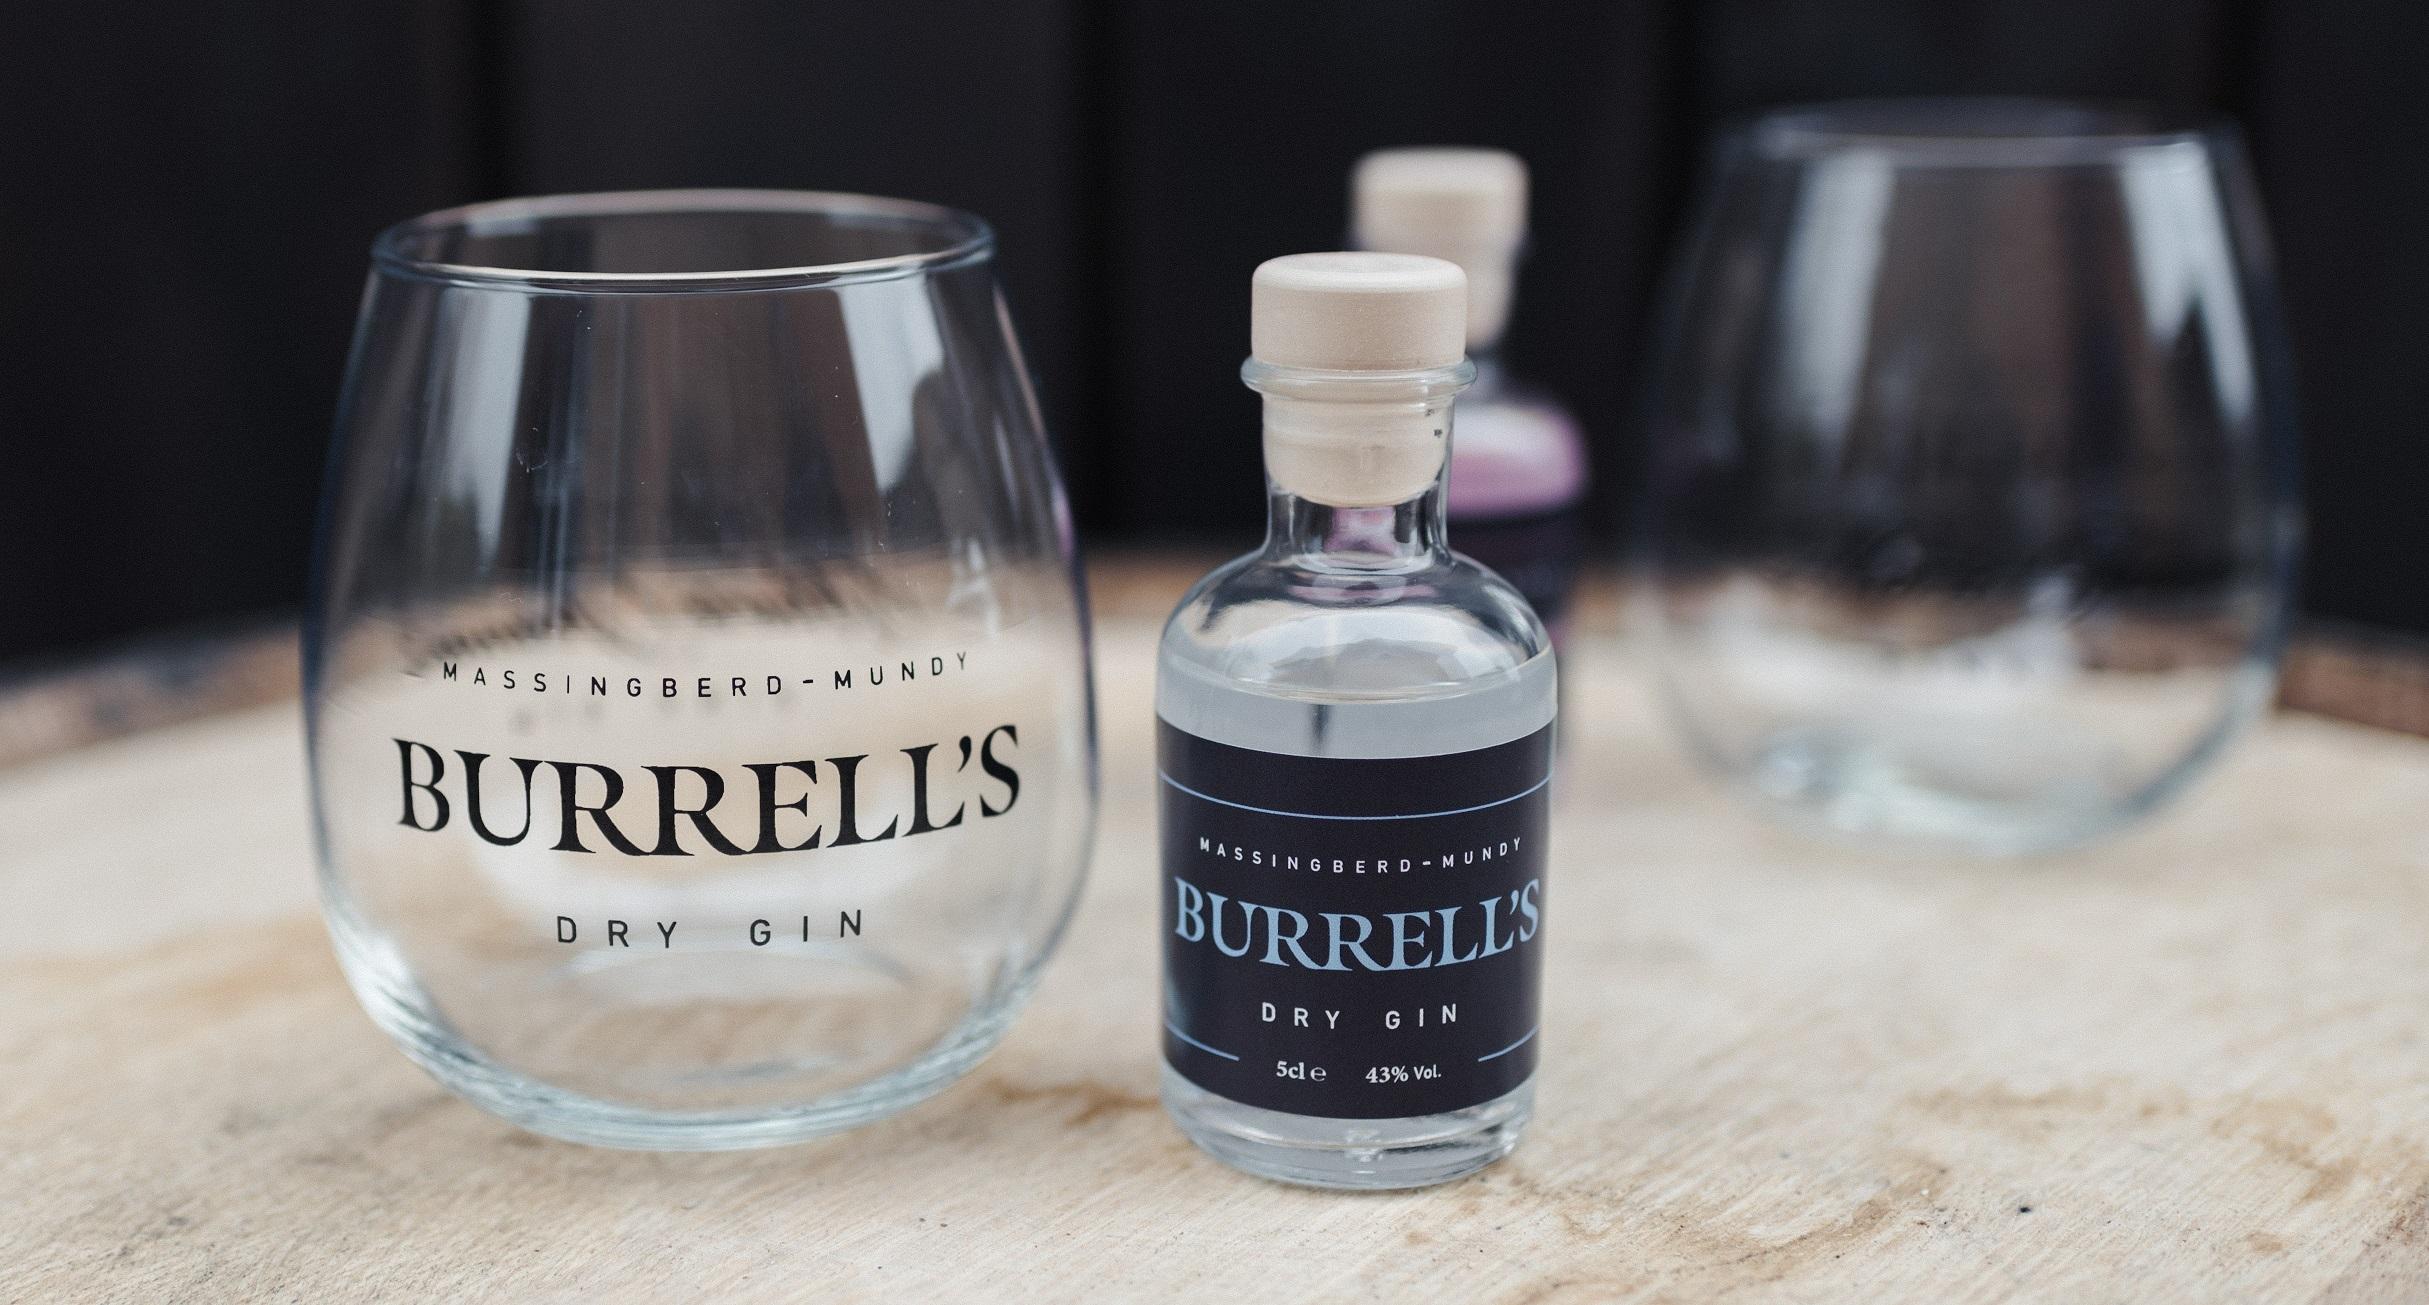 Burrell's London Dry Gin alongside a stemless balloon glass